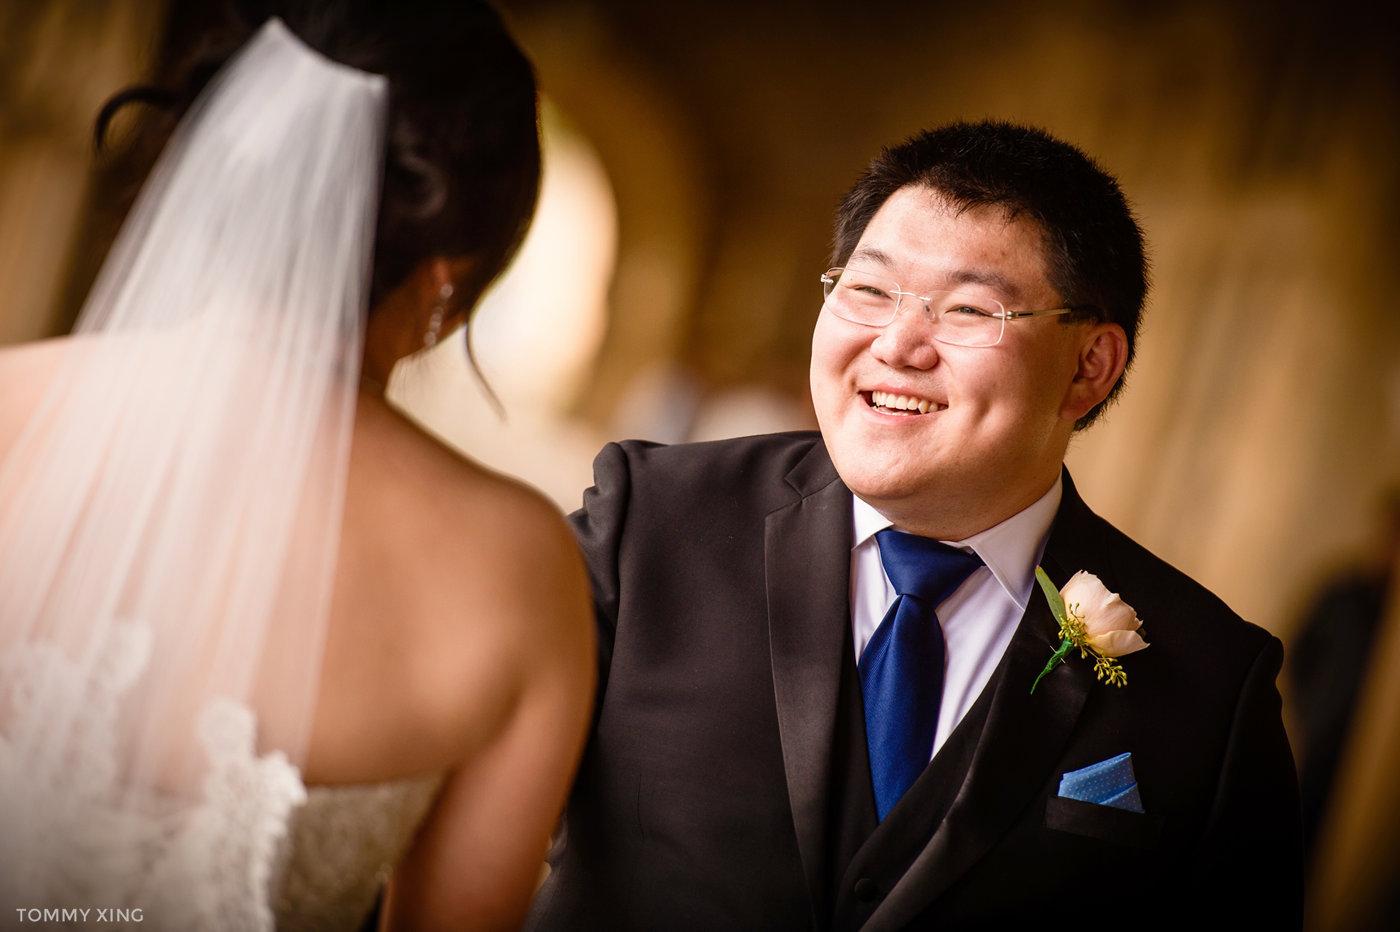 STANFORD MEMORIAL CHURCH WEDDING - Wenjie & Chengcheng - SAN FRANCISCO BAY AREA 斯坦福教堂婚礼跟拍 - 洛杉矶婚礼婚纱照摄影师 Tommy Xing Photography154.jpg